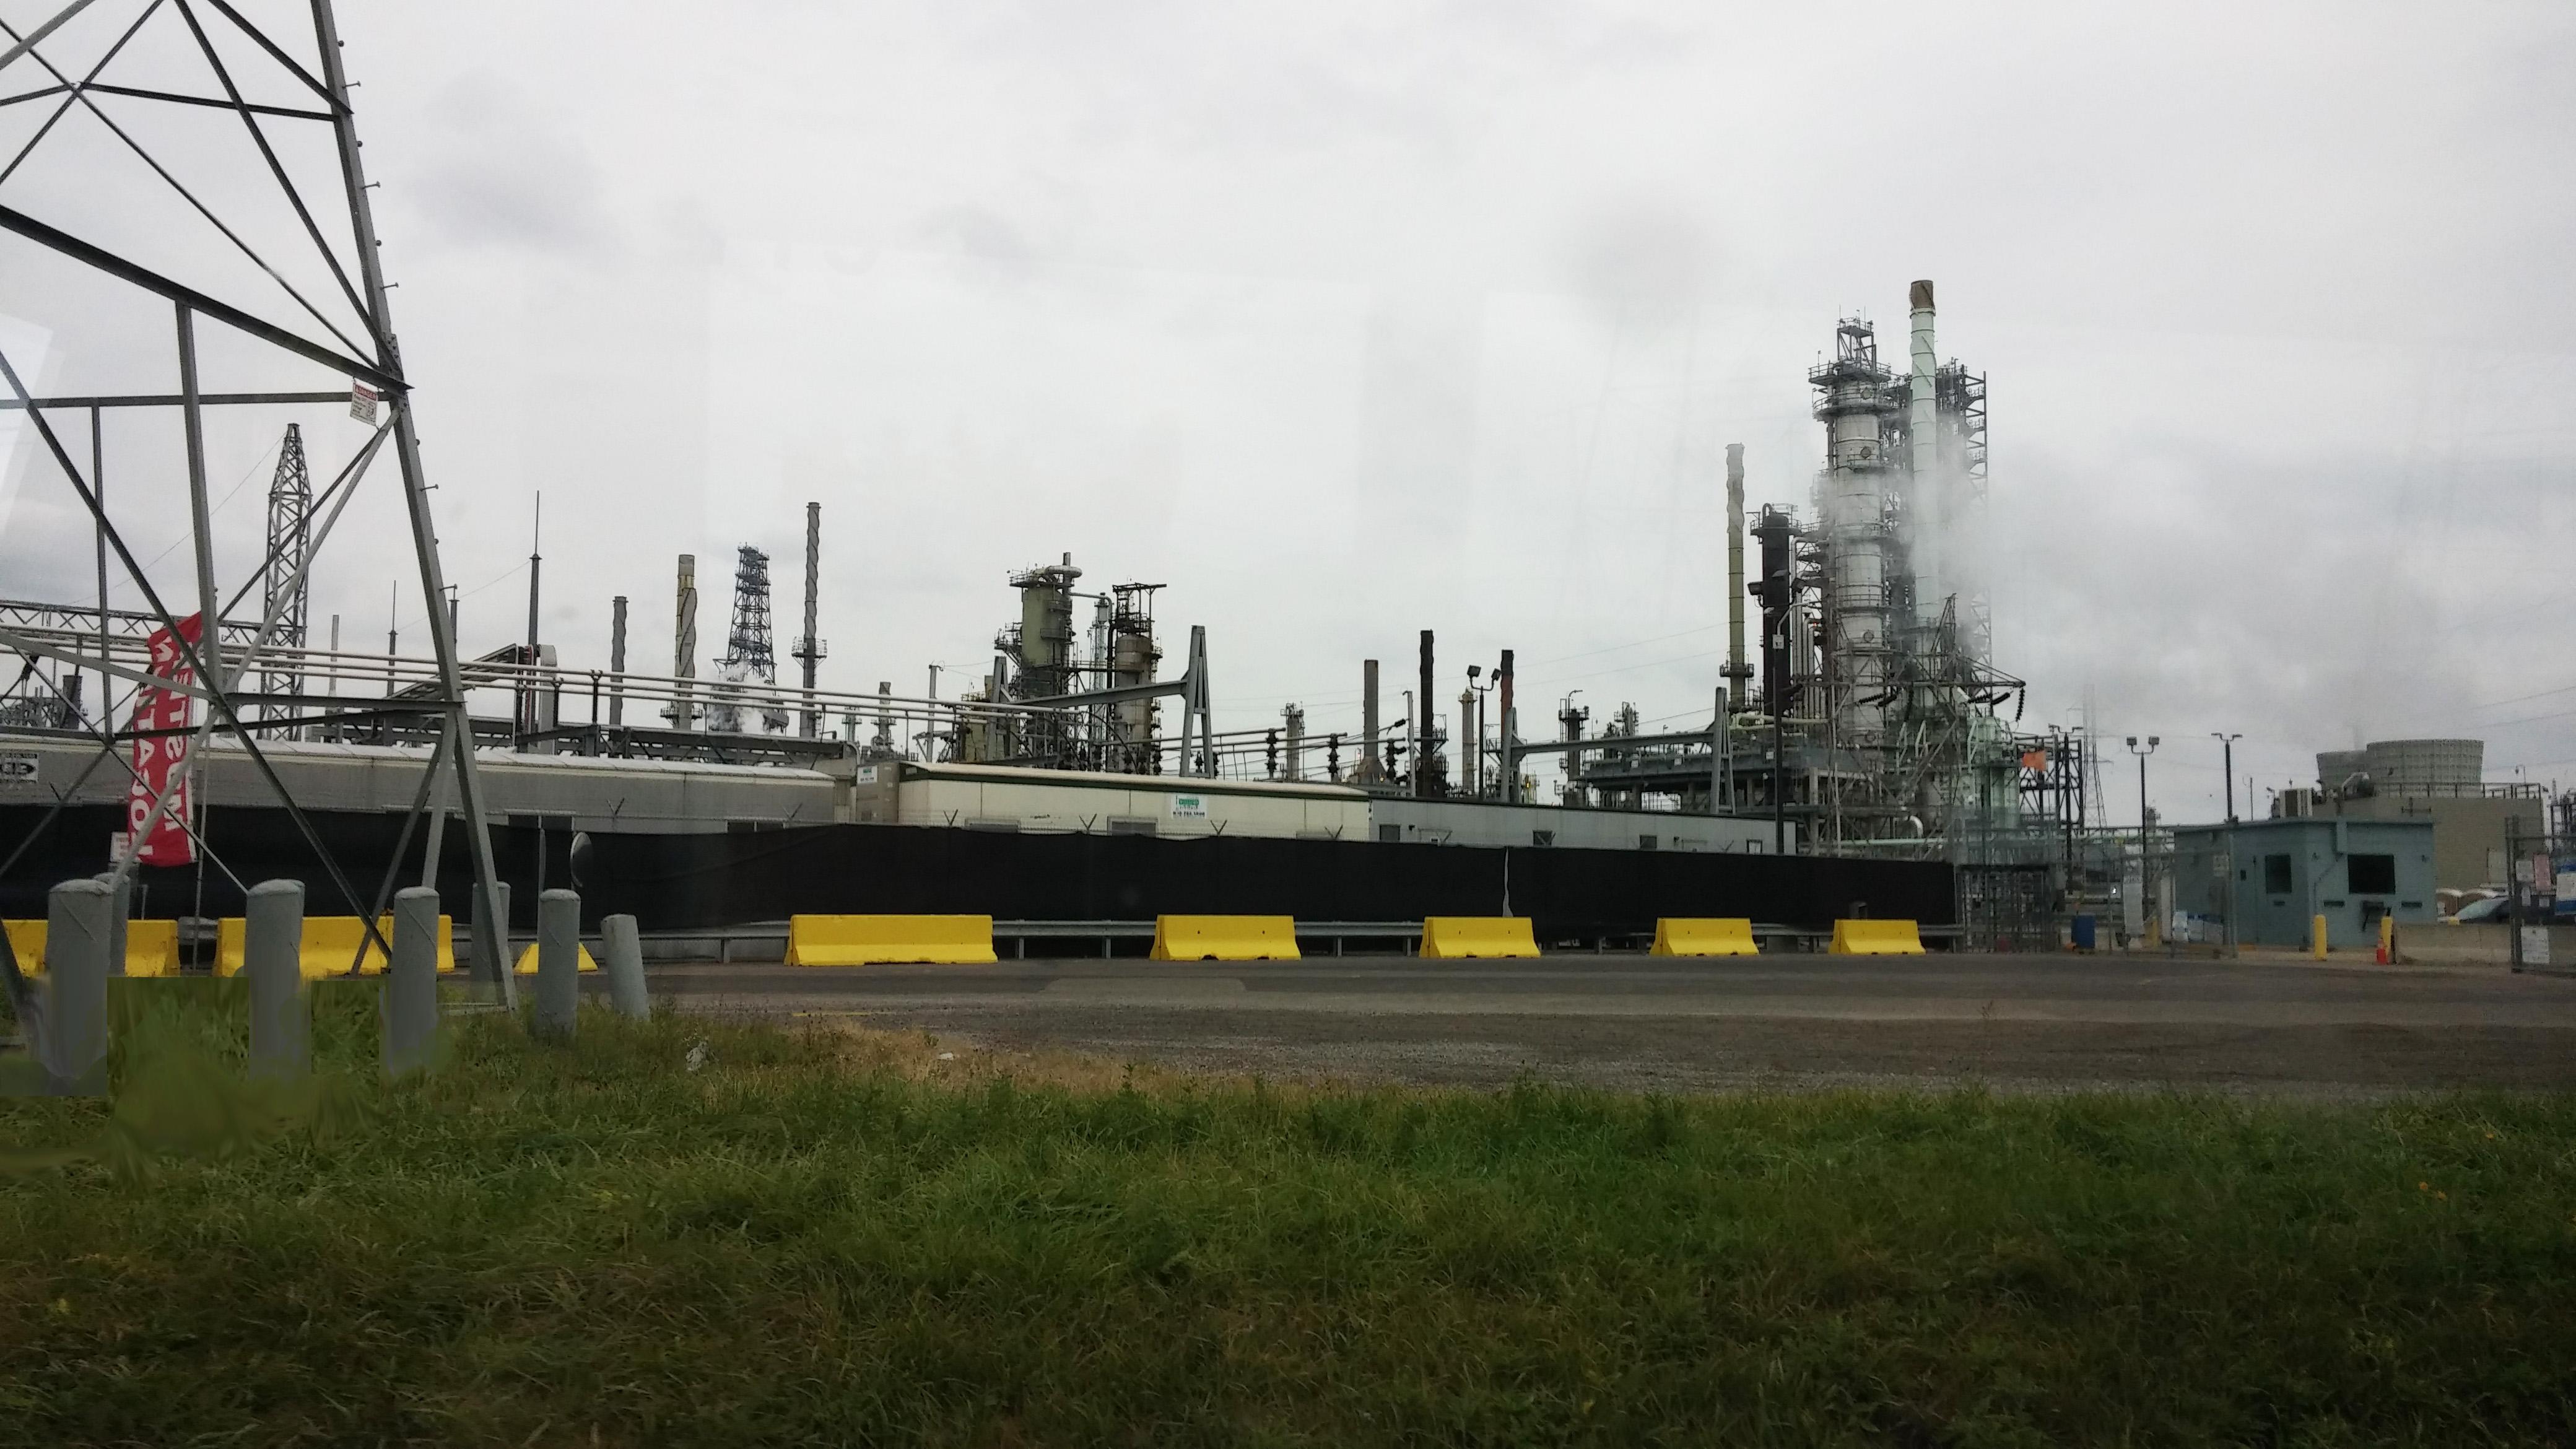 Marathon Oil Refinery